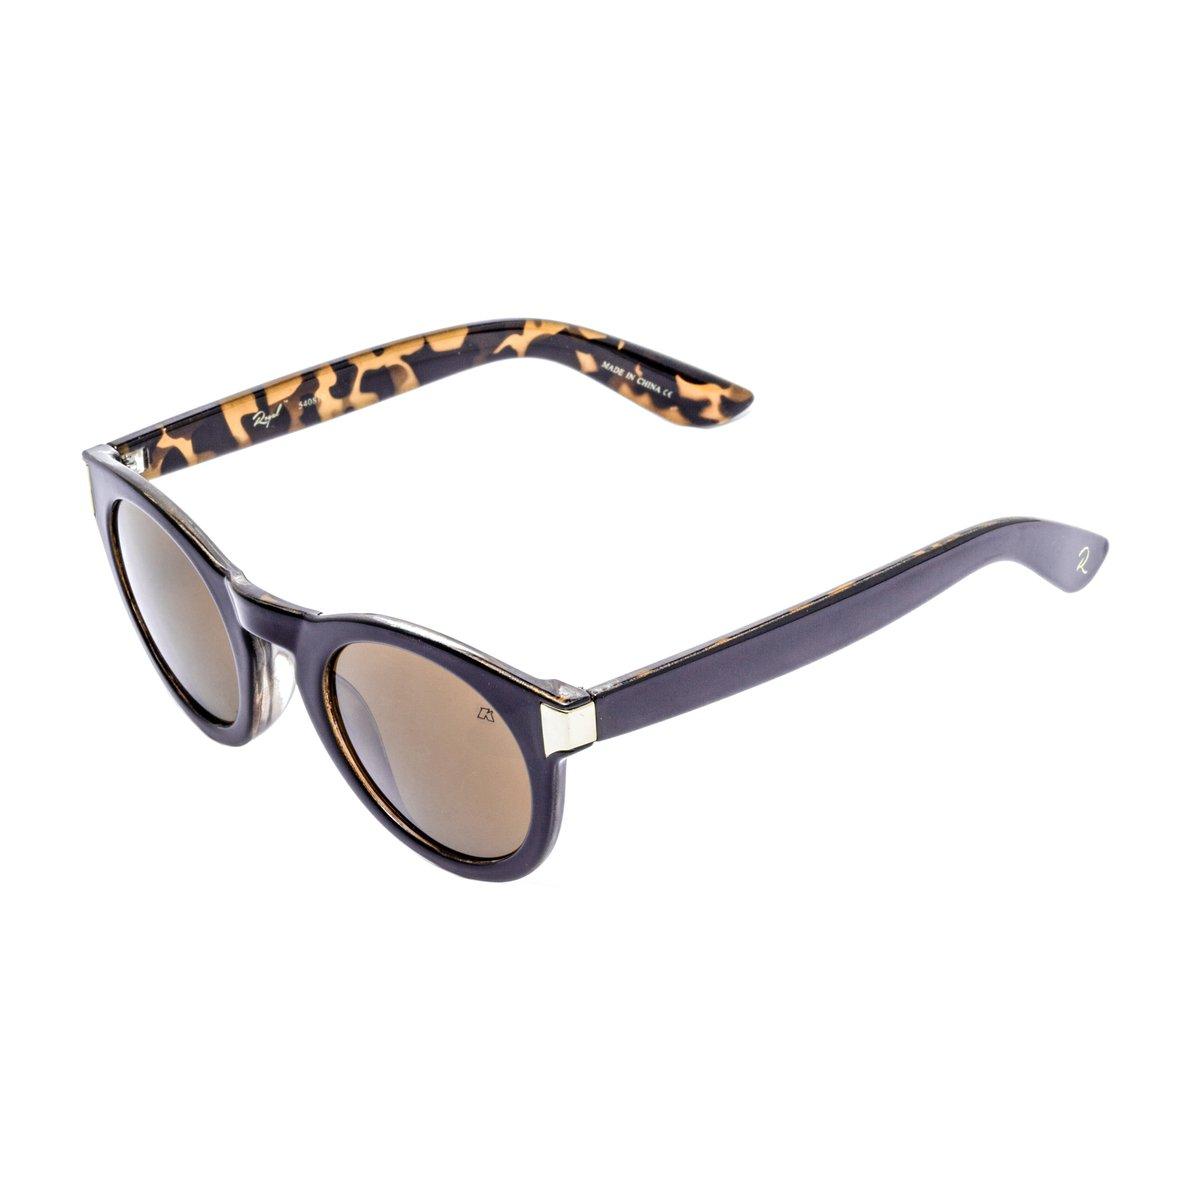 e5ee6c8212b71 Óculos de Sol Khatto 540810 - Compre Agora   Zattini